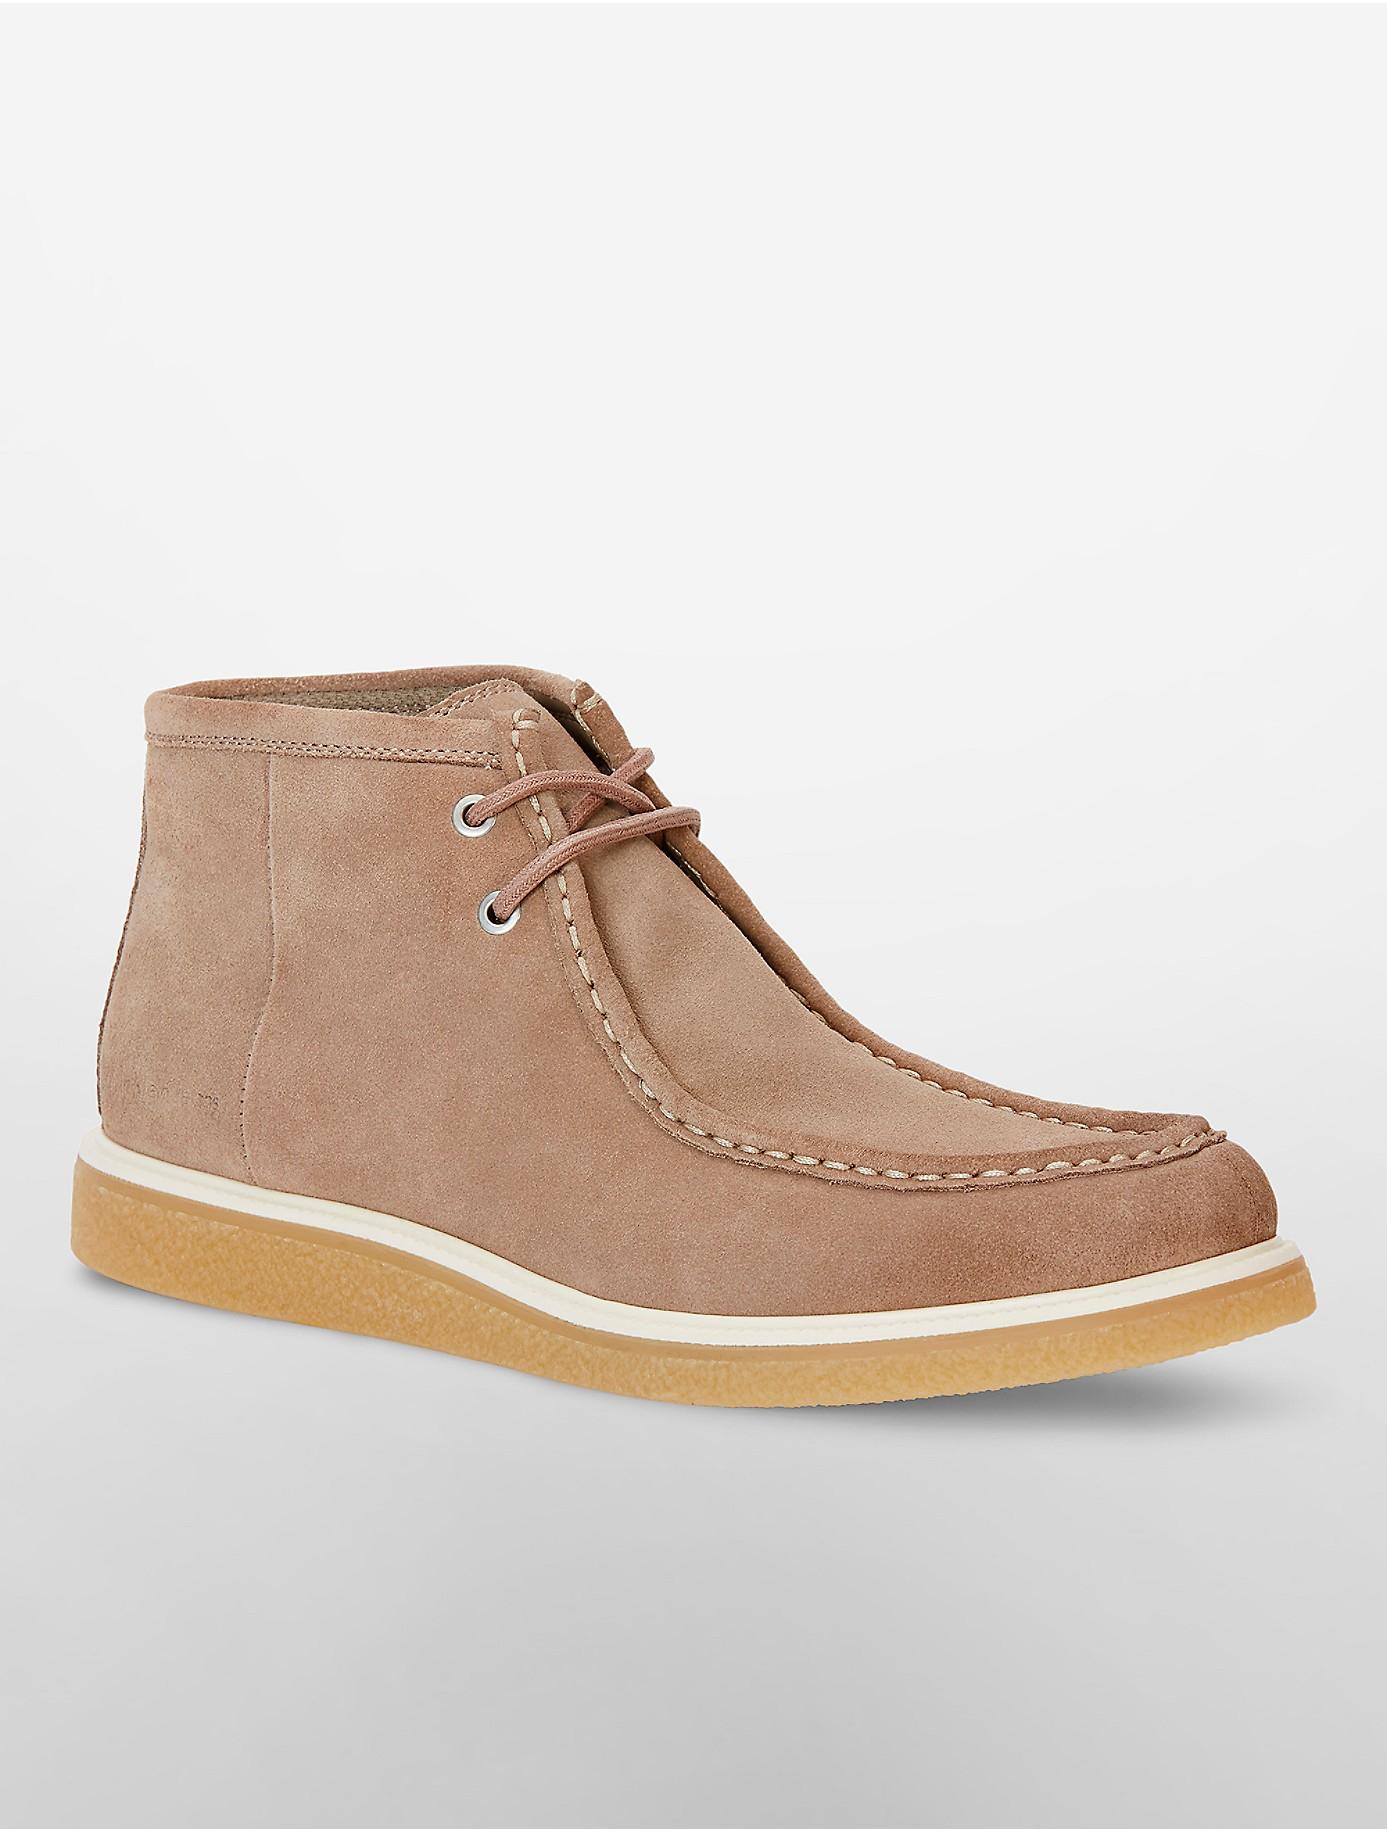 calvin klein fabien suede boot in brown for lyst